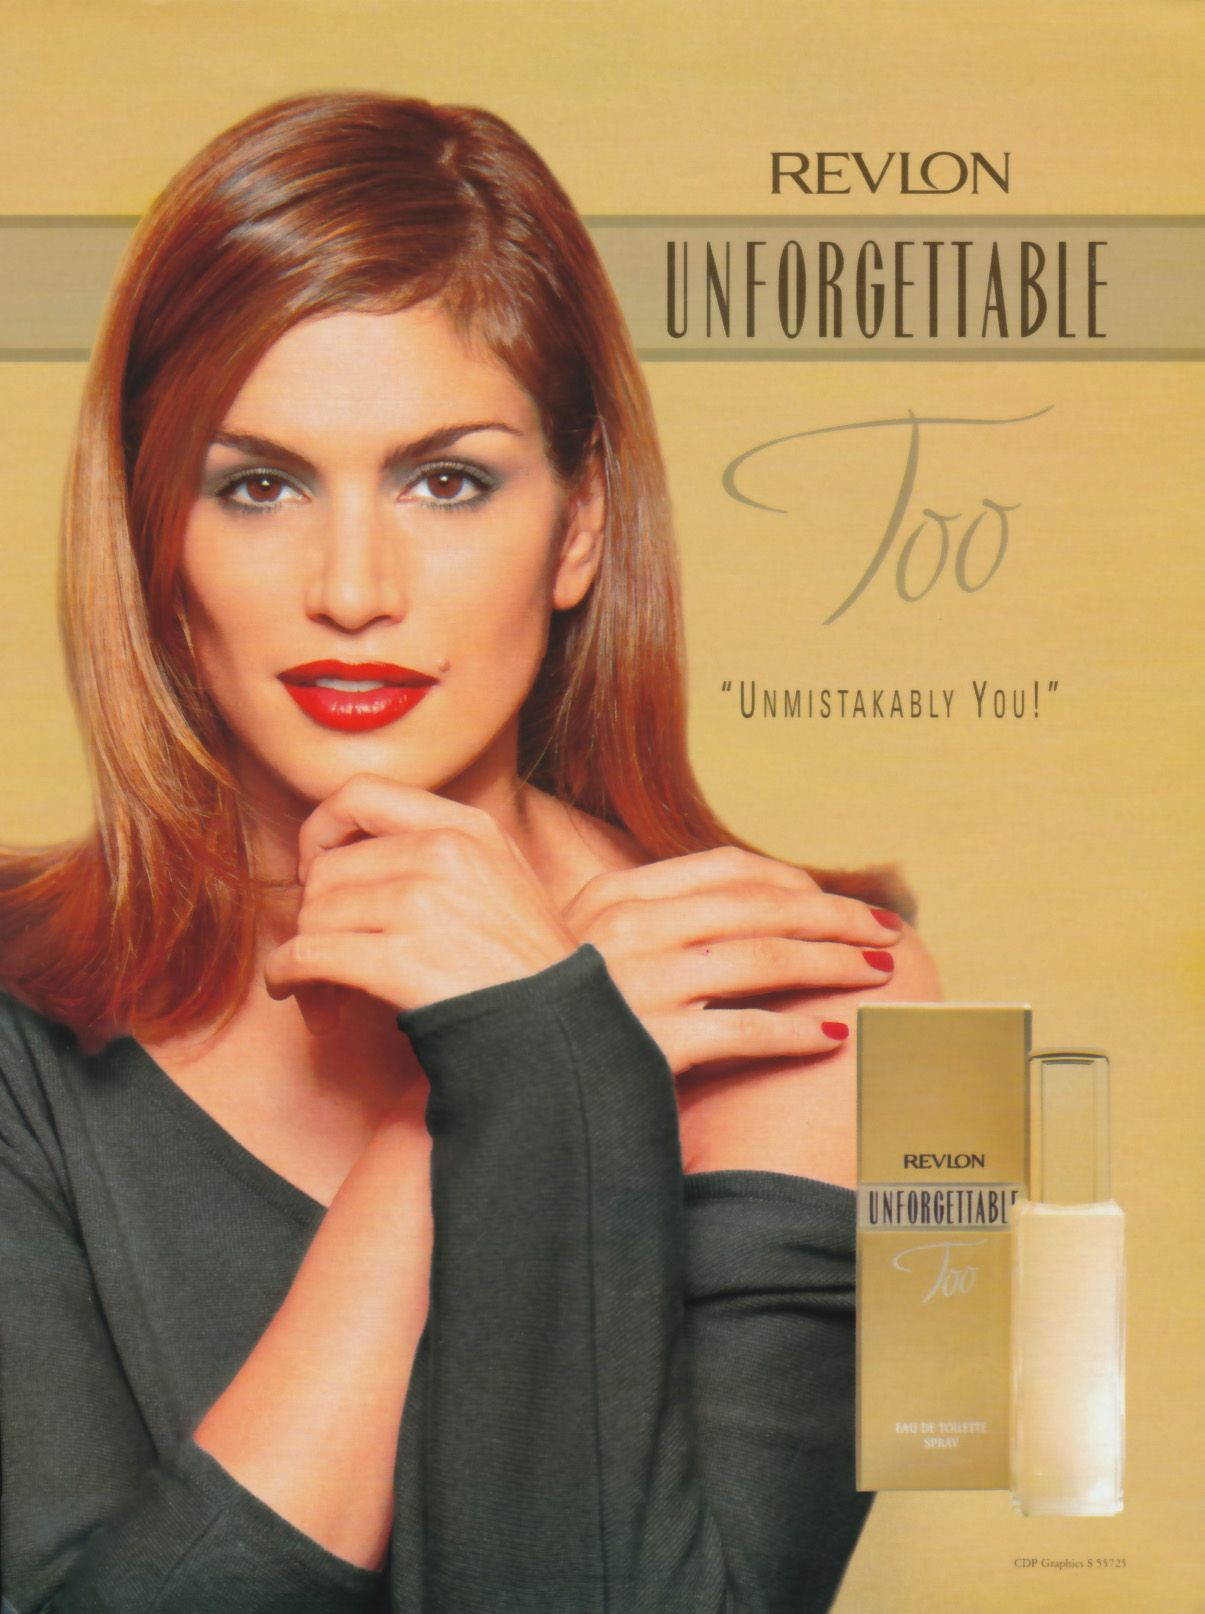 cindy crawford cover | AD: Revlon Fragrance | Beauty Mark ...